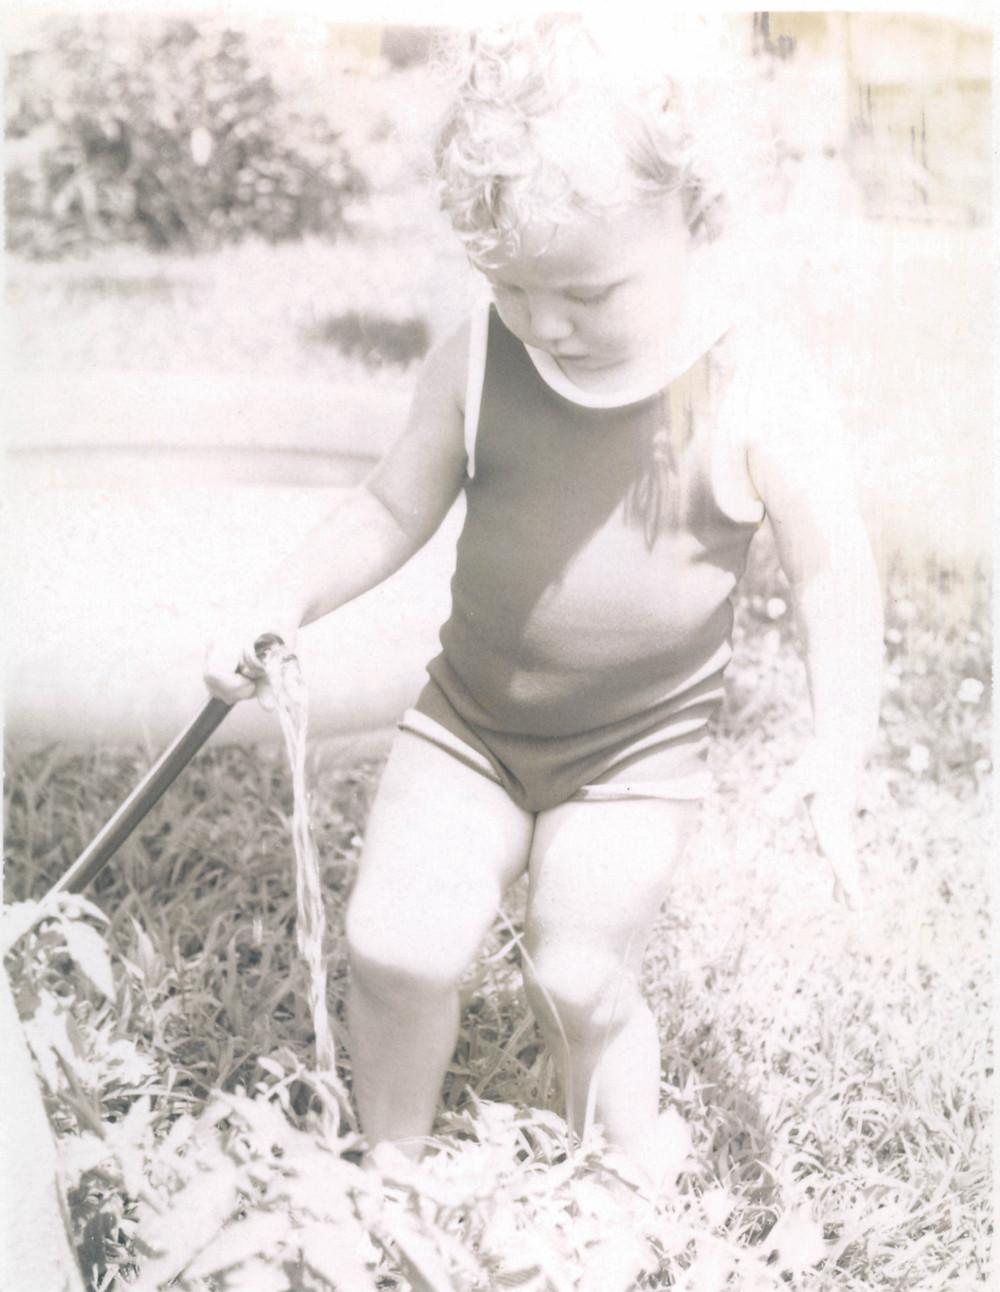 Little girl holding a hose FF&FF